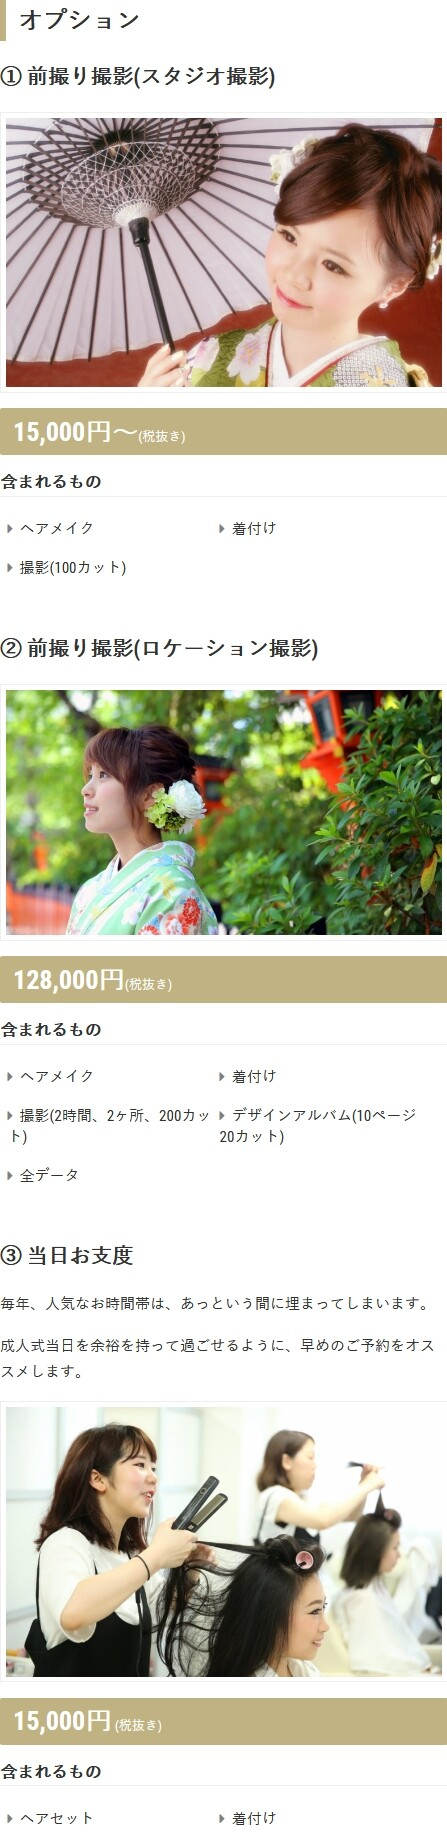 Screenshot_2021-01-12 成人式のお客様 Kimono-ya Natty 岡株式会社(2)_result